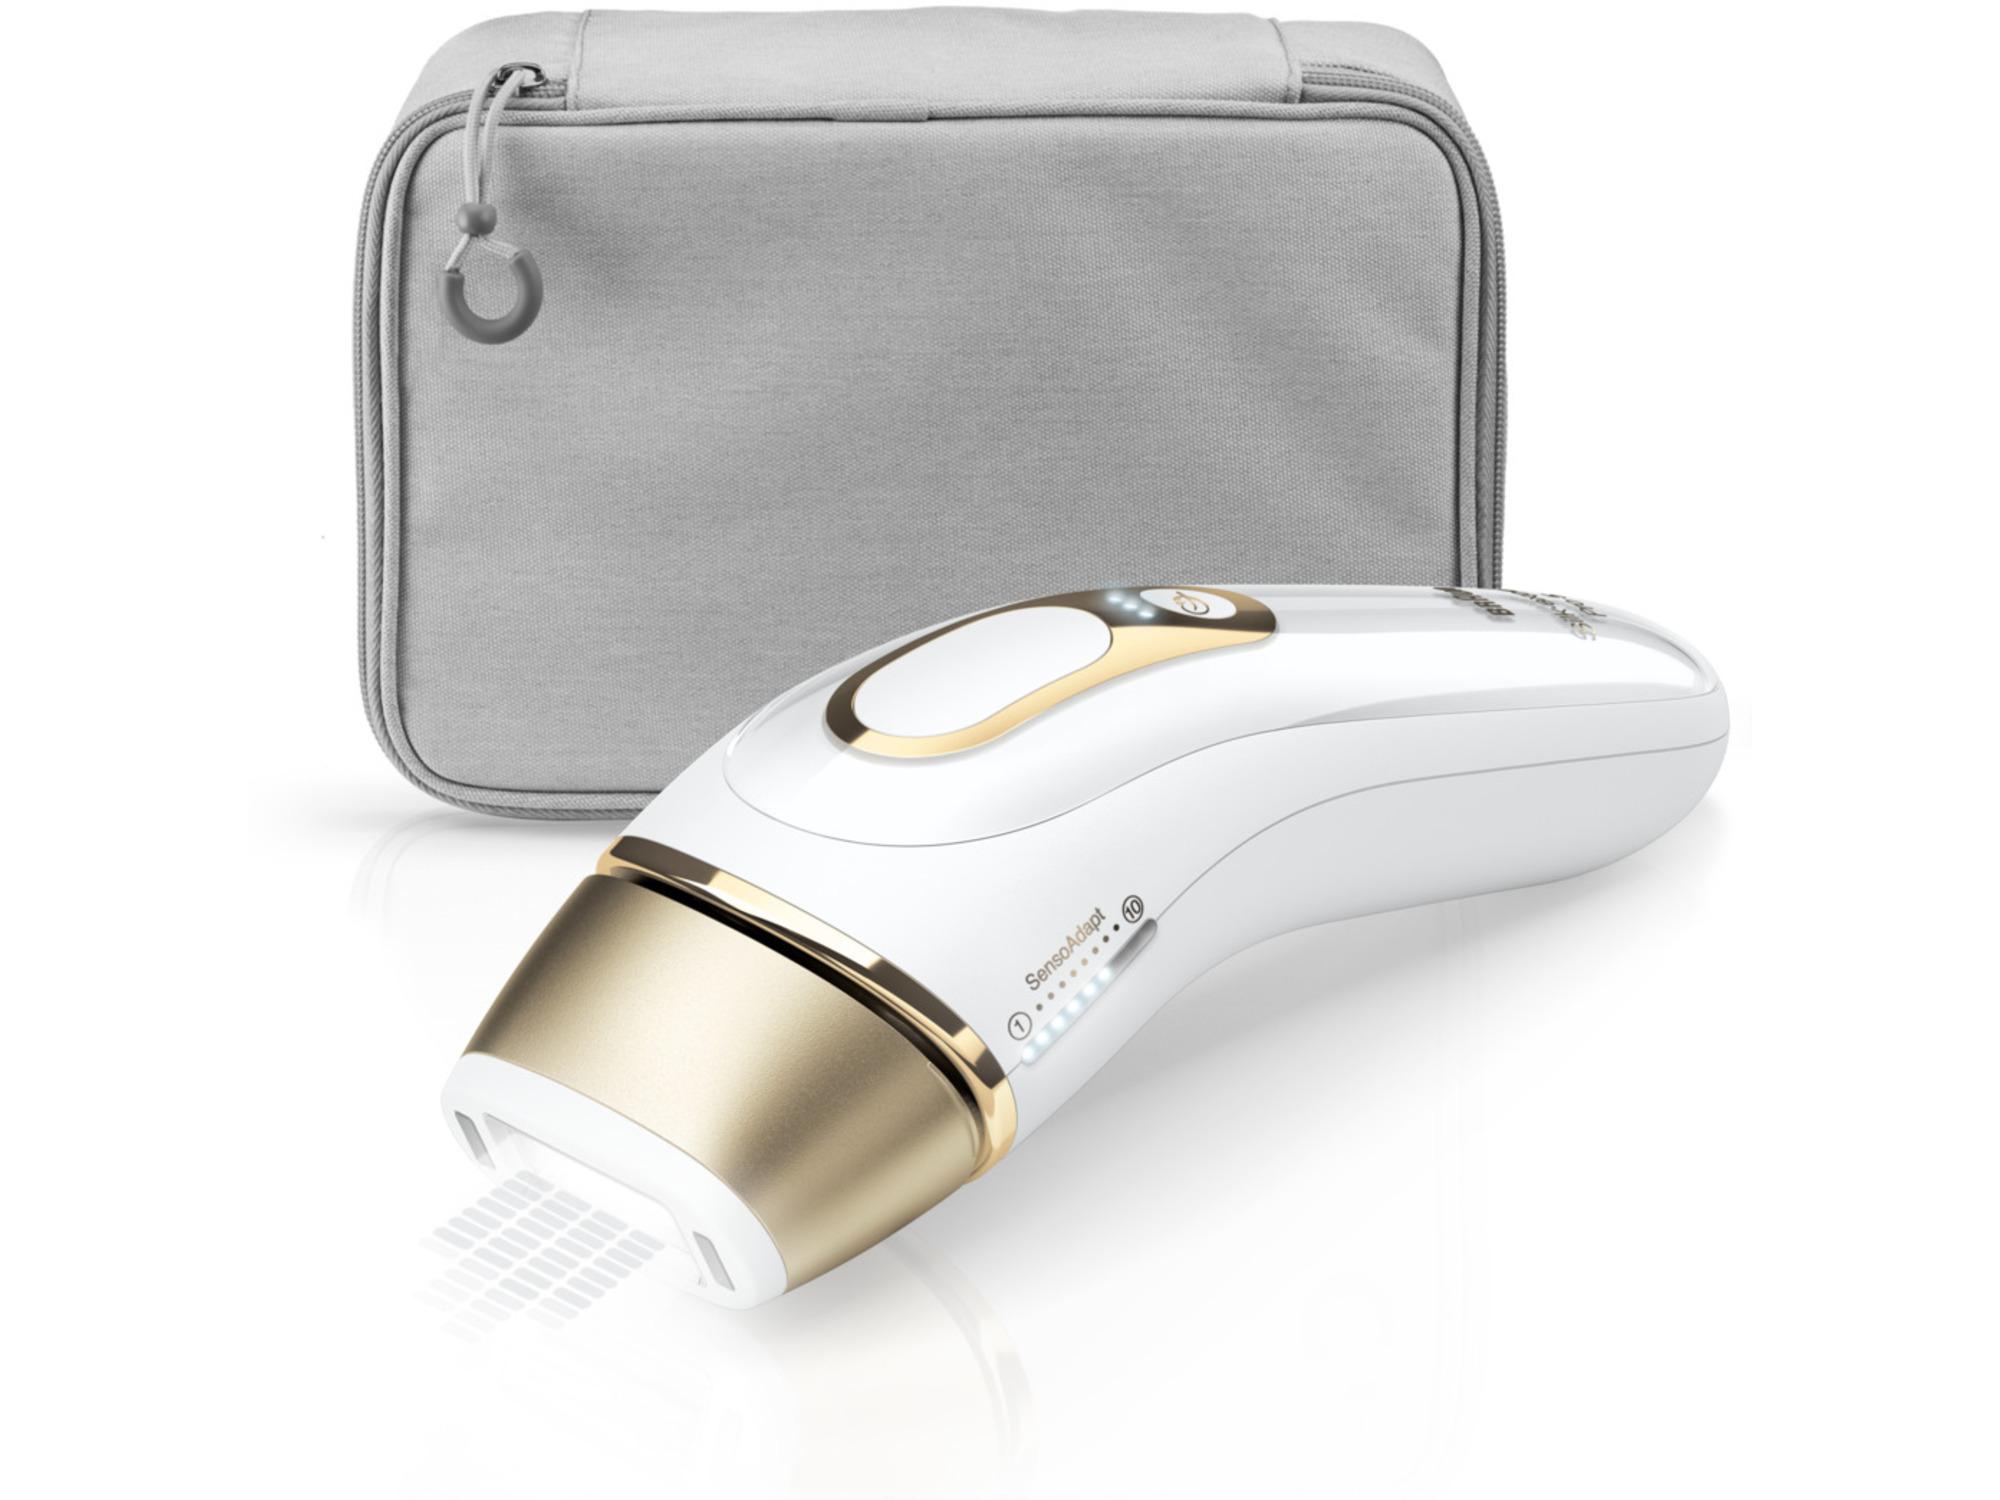 Braun Epilator Ipl Pl5014 Wht/Gold Box